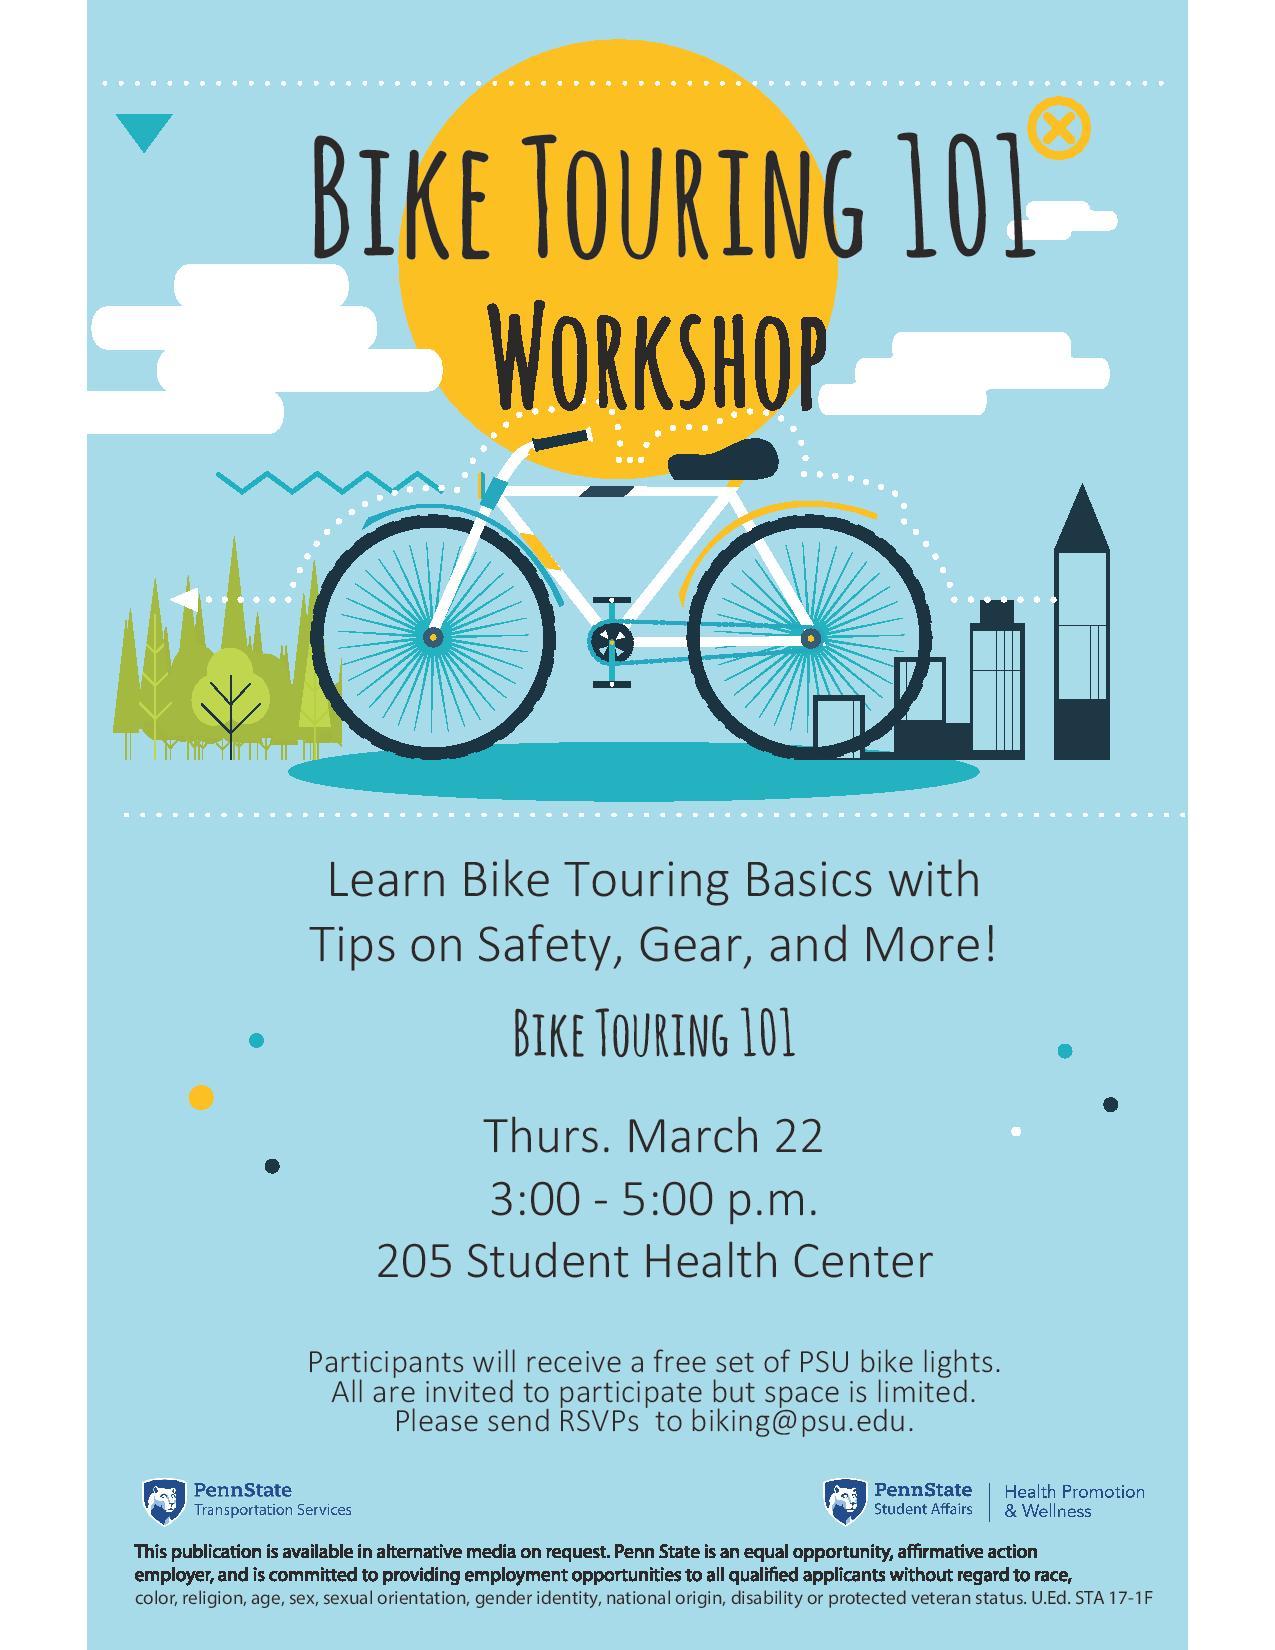 March 22 Bike Touring 101 Workshop Flyer